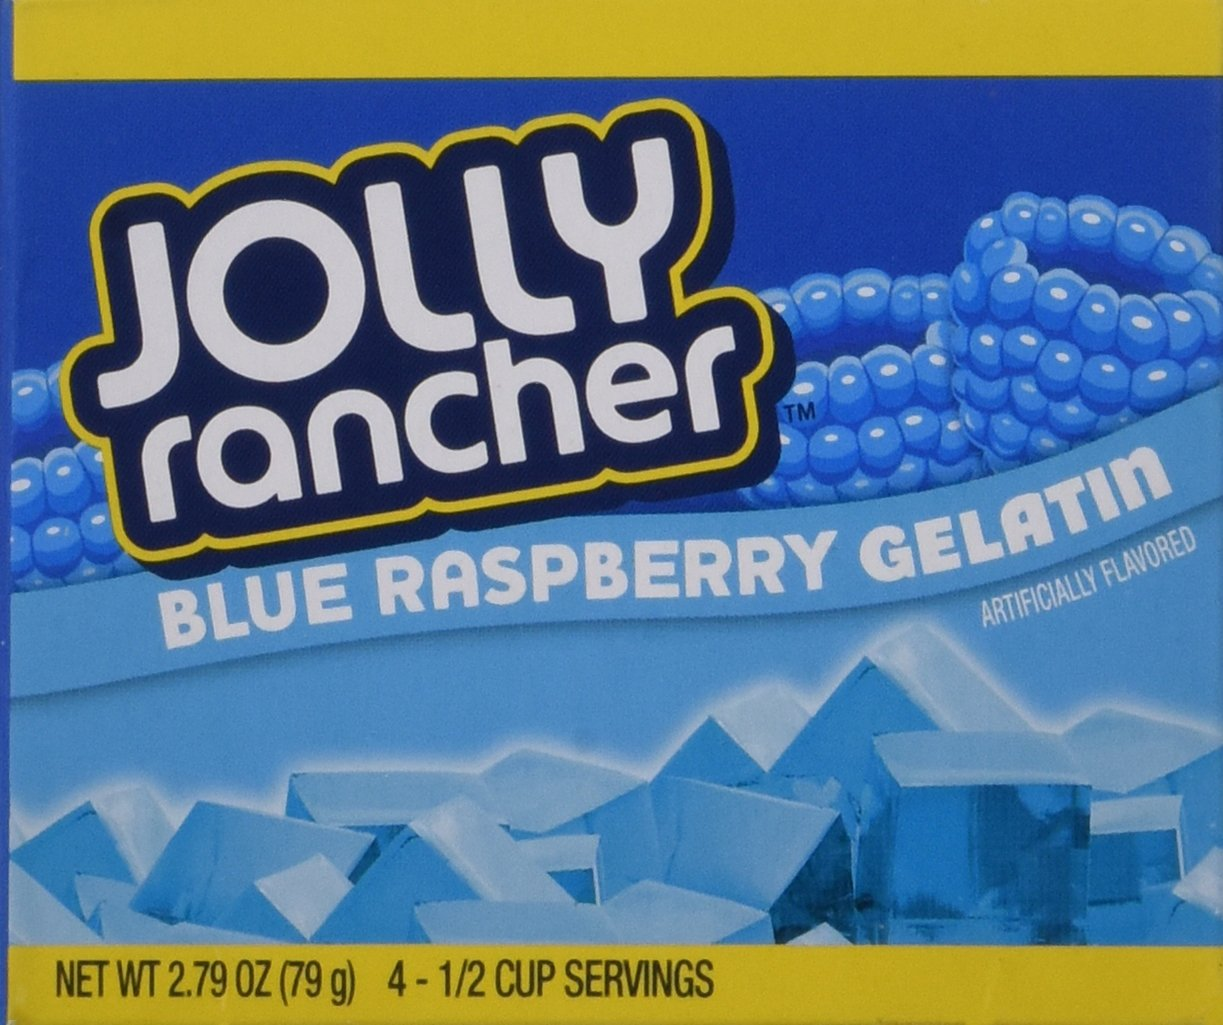 JOLLY RANCHER Blue Raspberry Gelatin Jello 2.79 oz (Pack of 4)